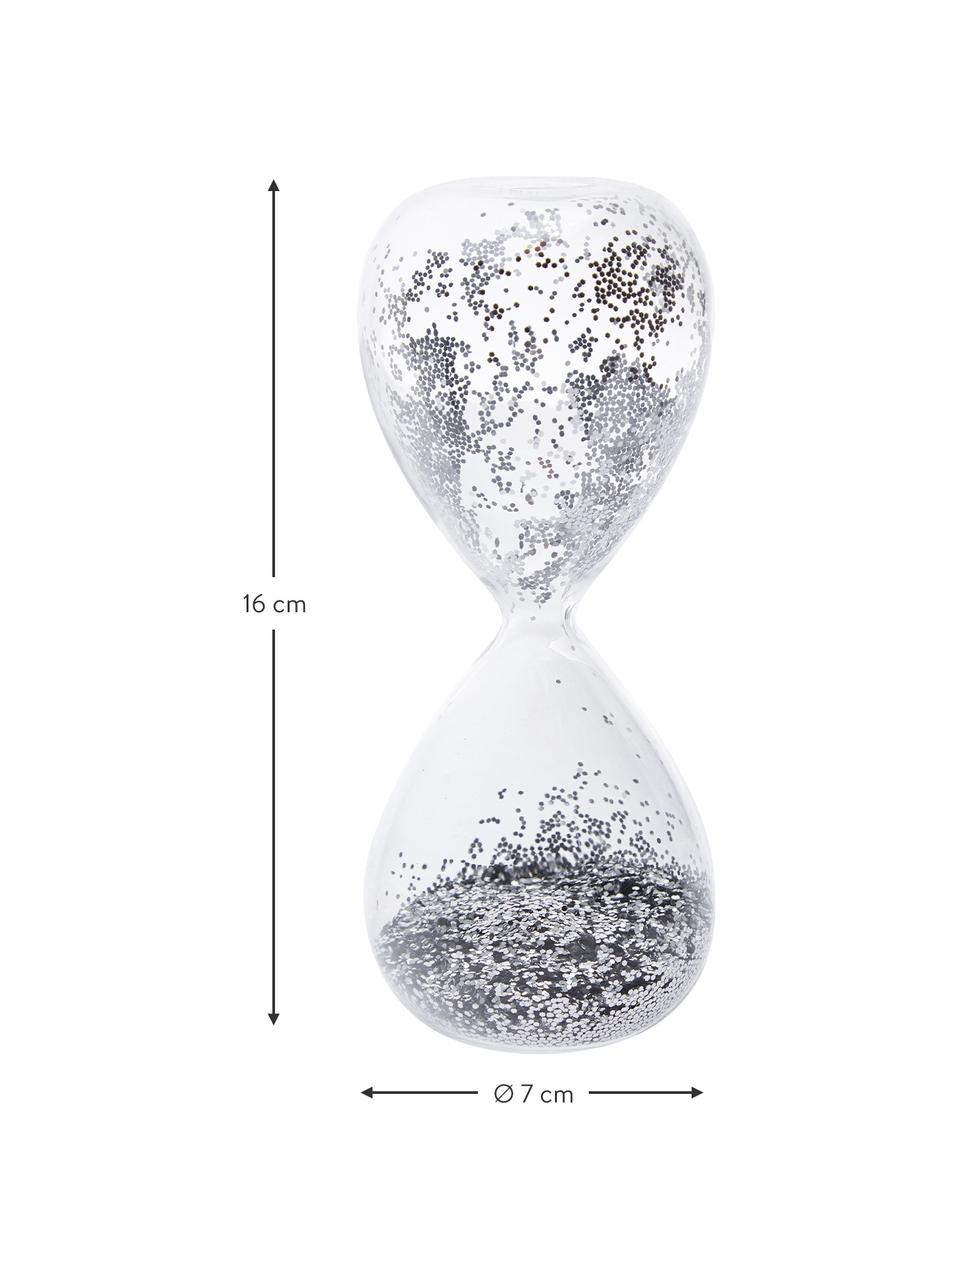 Deko-Objekt Hourglass, Transparent, Silberfarben, Ø 7 x H 16 cm